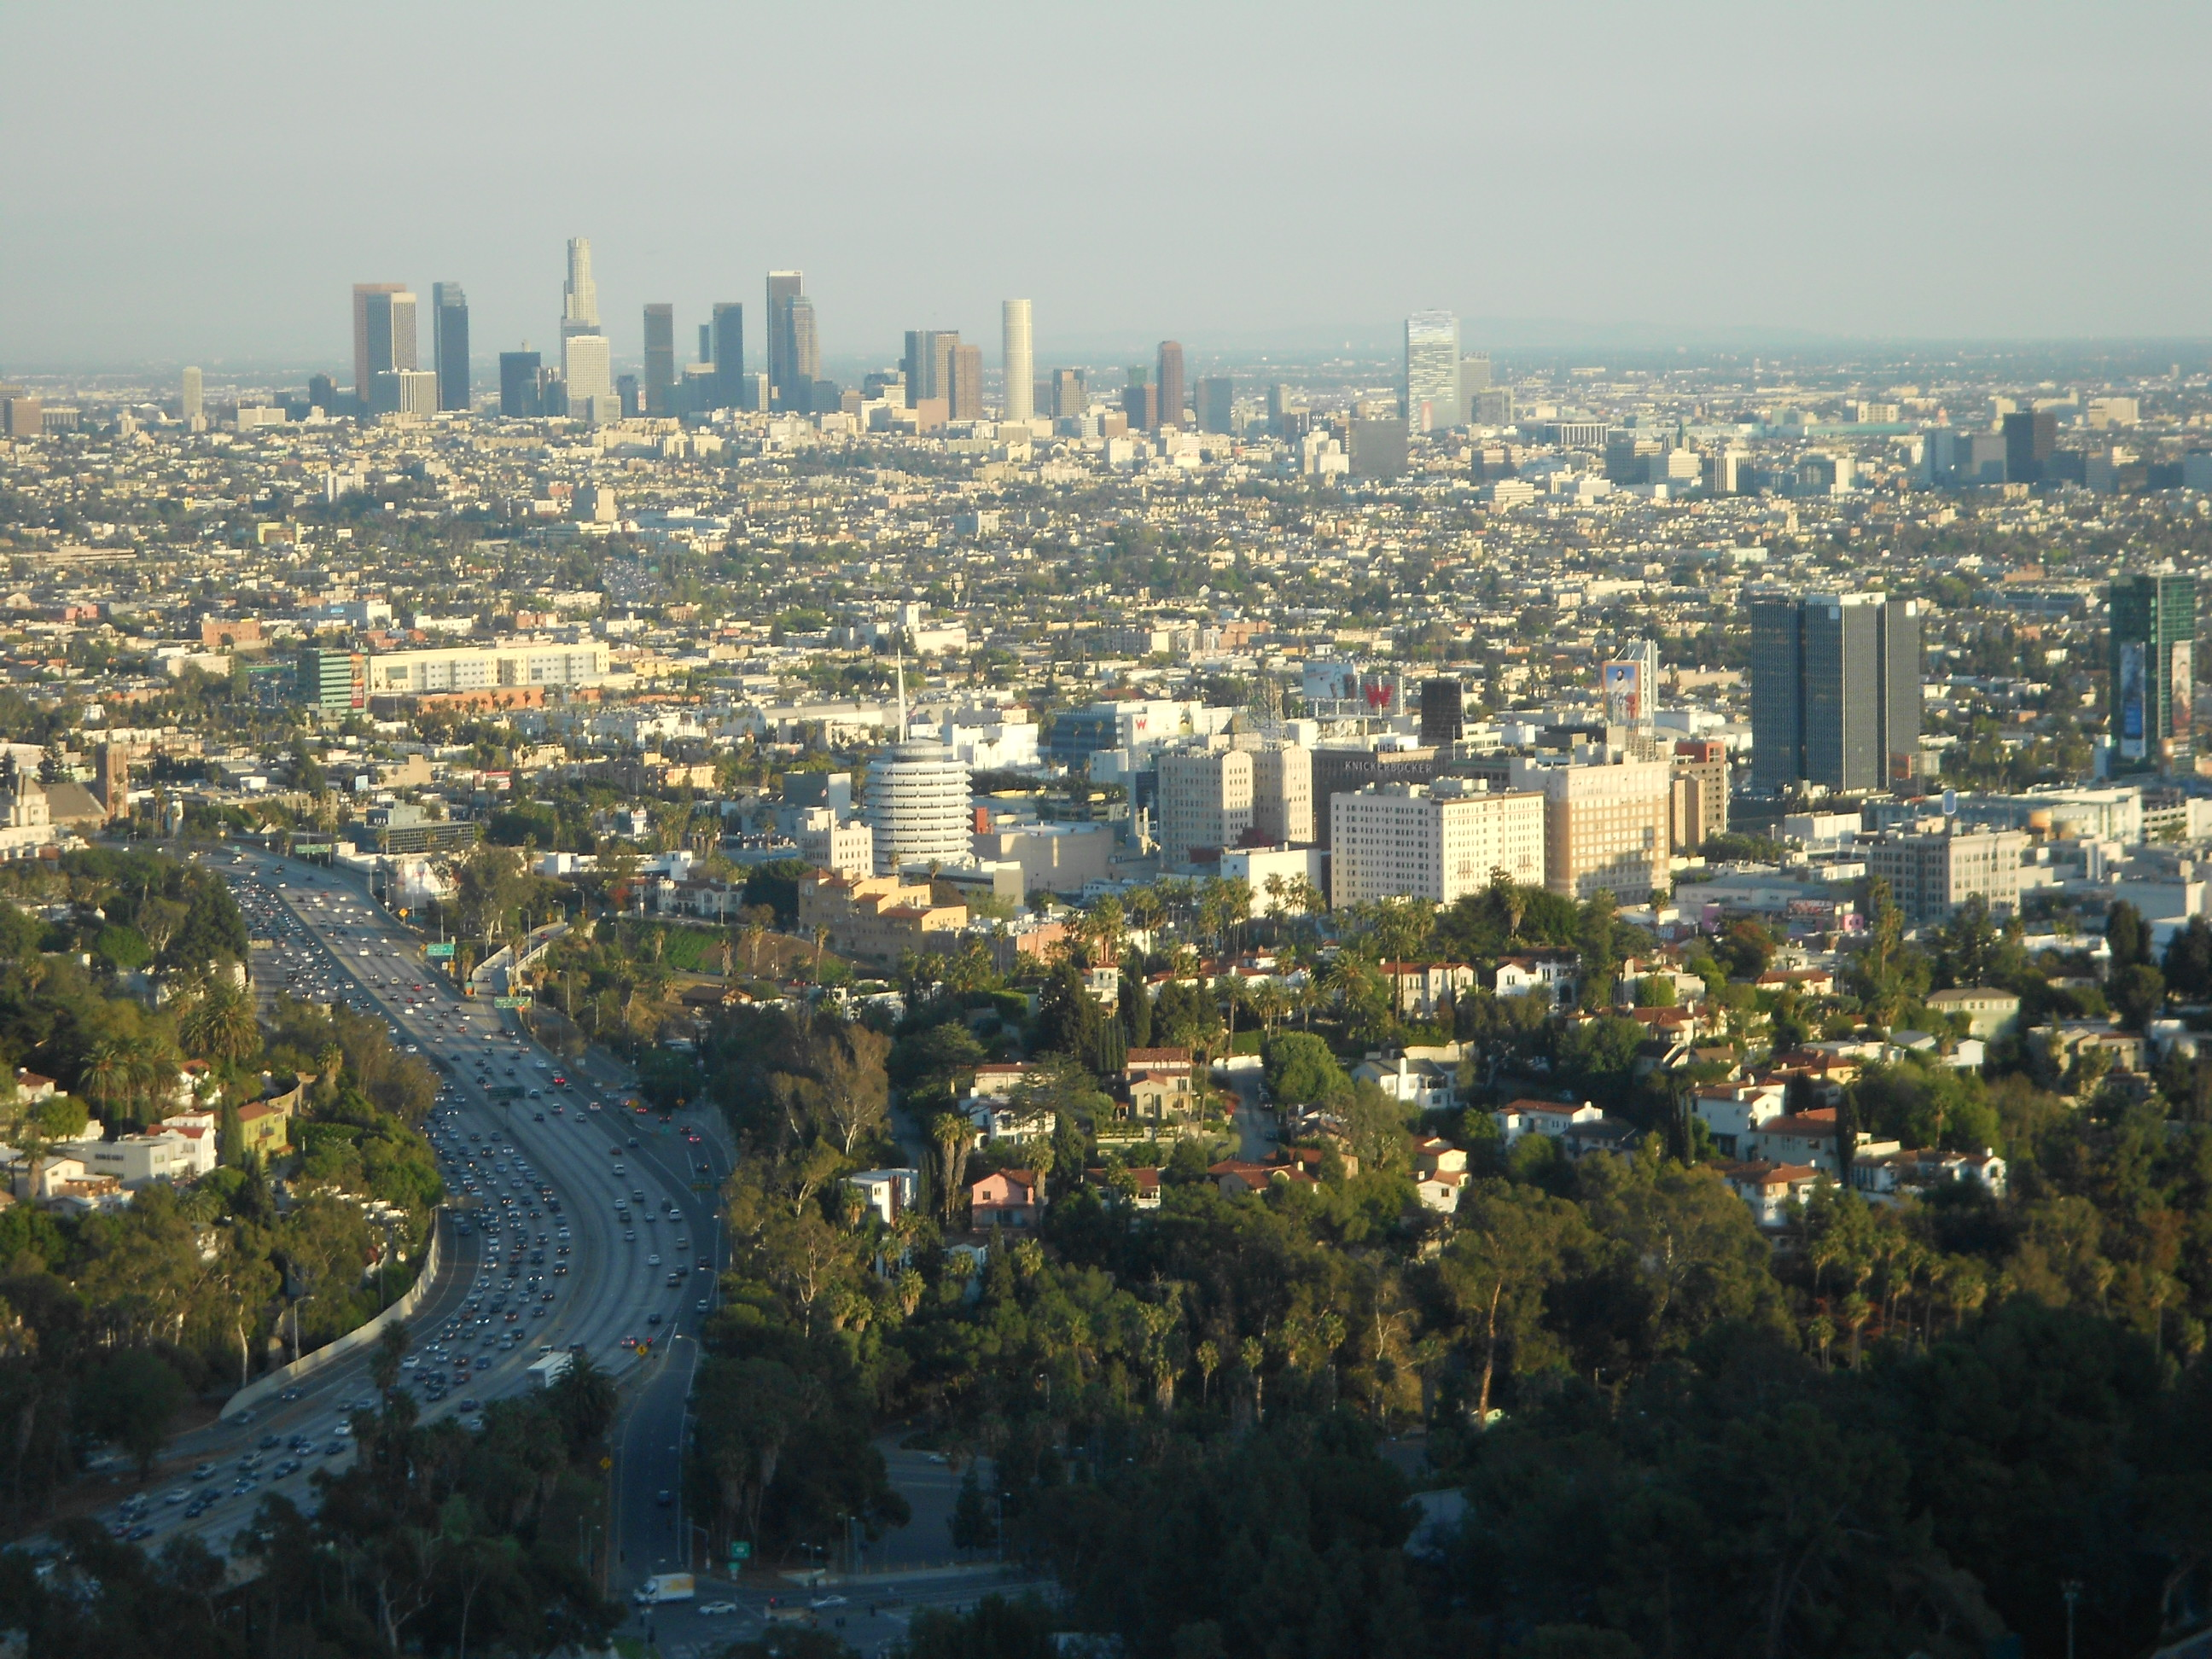 Vista de Los Angeles pela Mulholland Drive